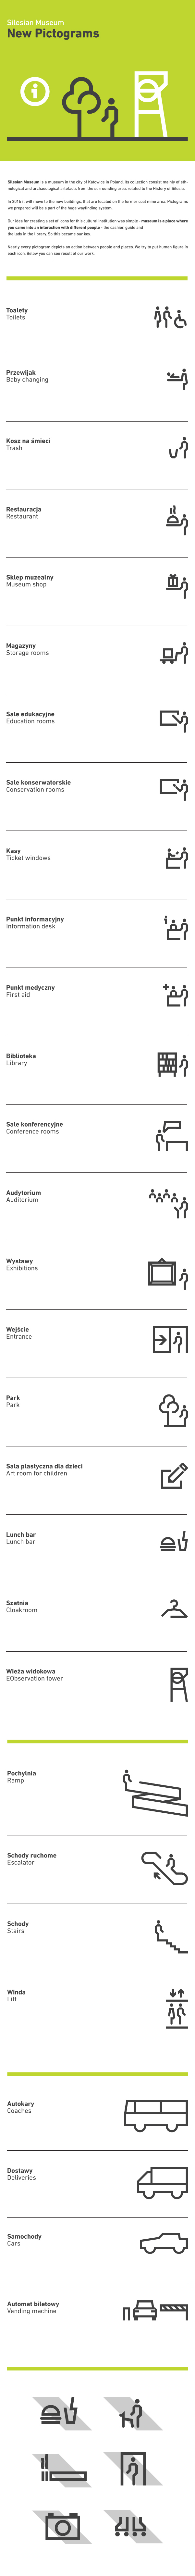 pictograms pictogram set museum wayfinding icons silesia Signage environmental